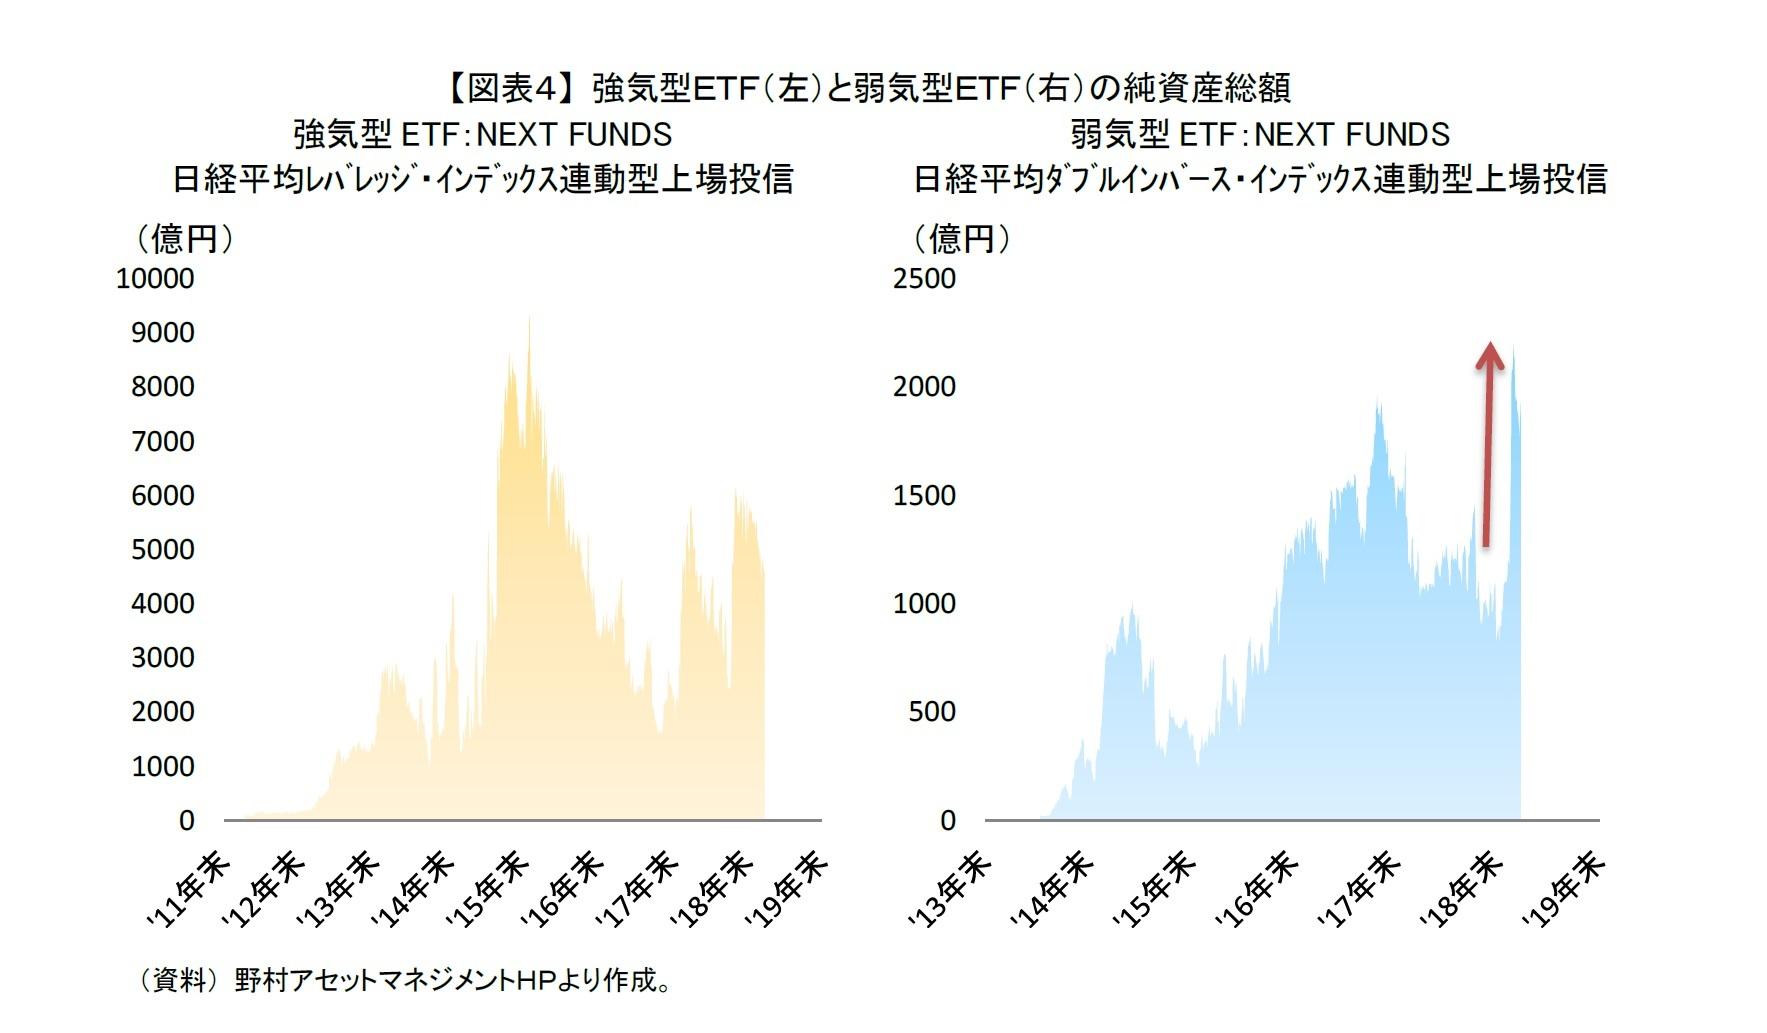 【図表4】 強気型ETF(左)と弱気型ETF(右)の純資産総額